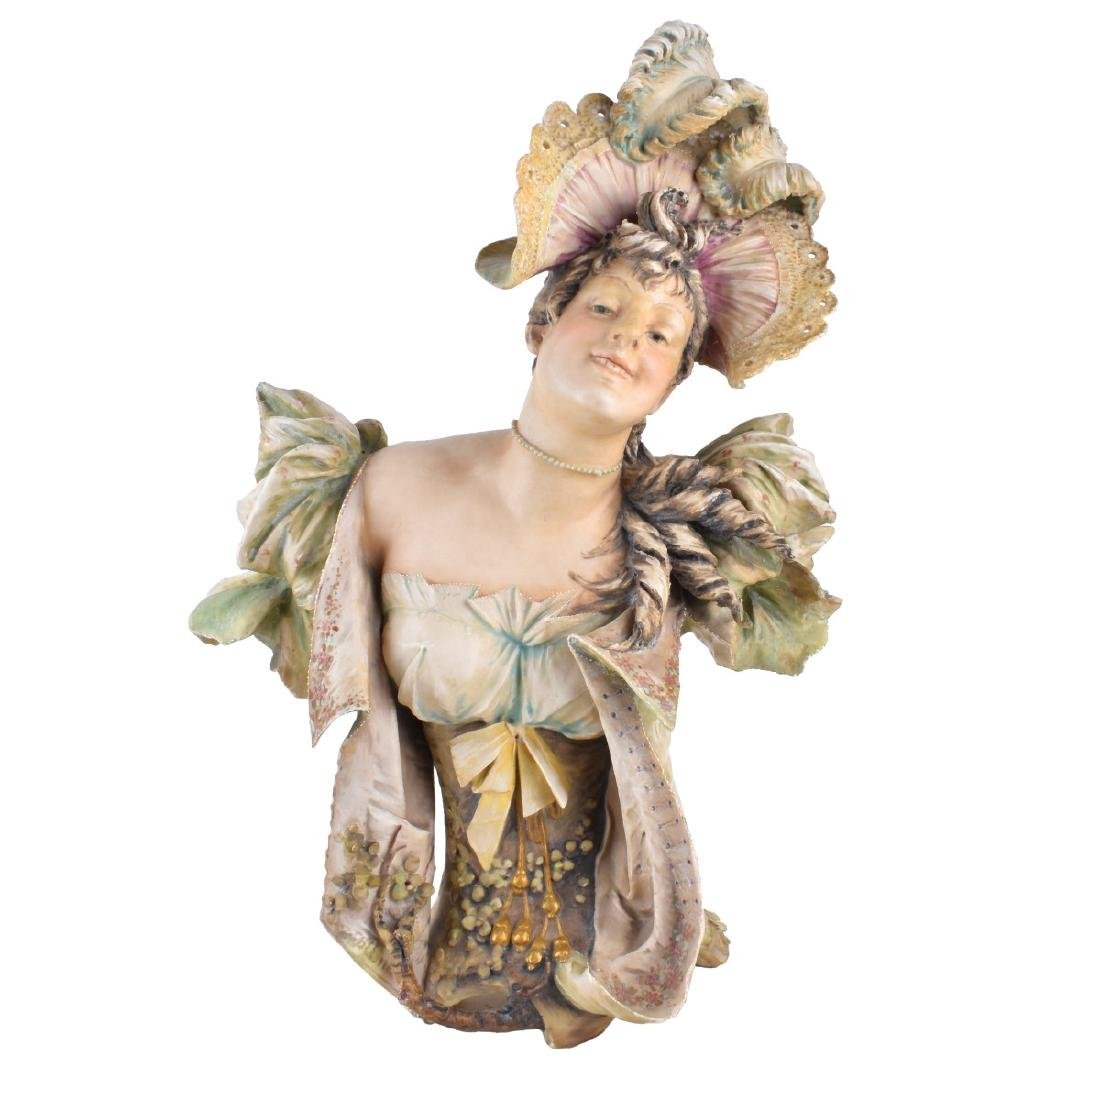 Turn Teplitz Art Nouveau Maiden Figural Bust